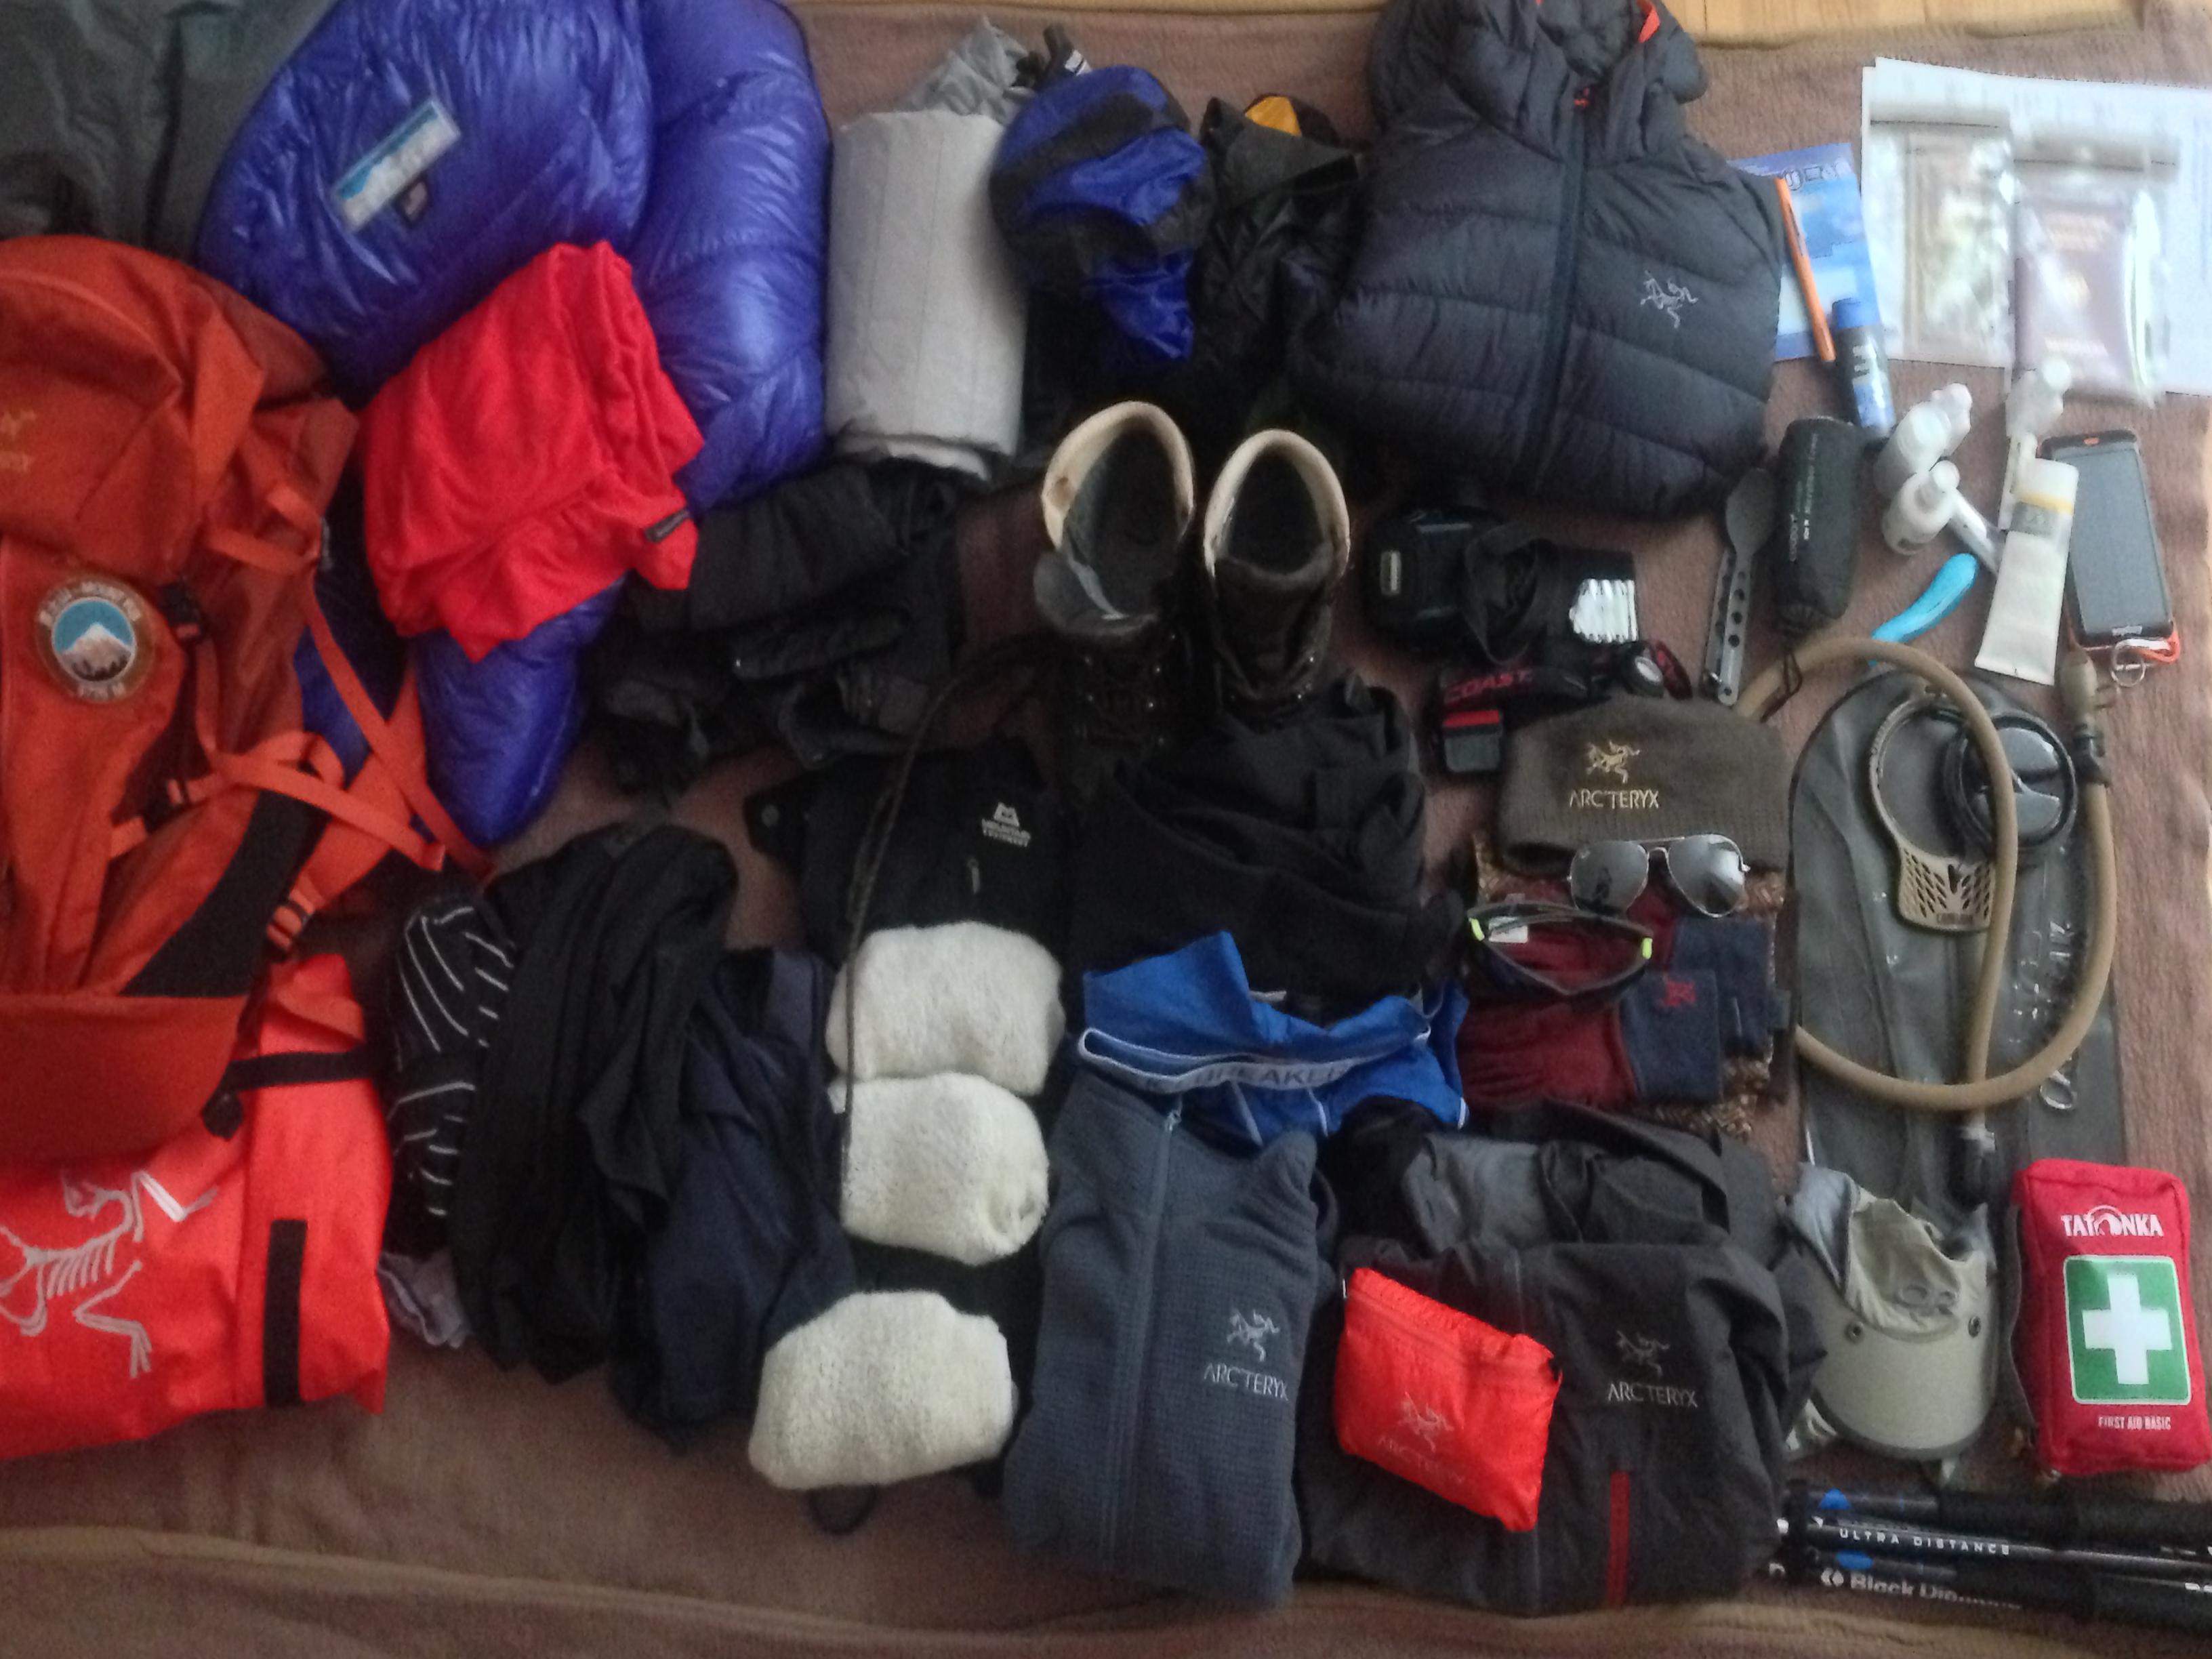 Kilimanjaro Packing List - Equipment uncompressed